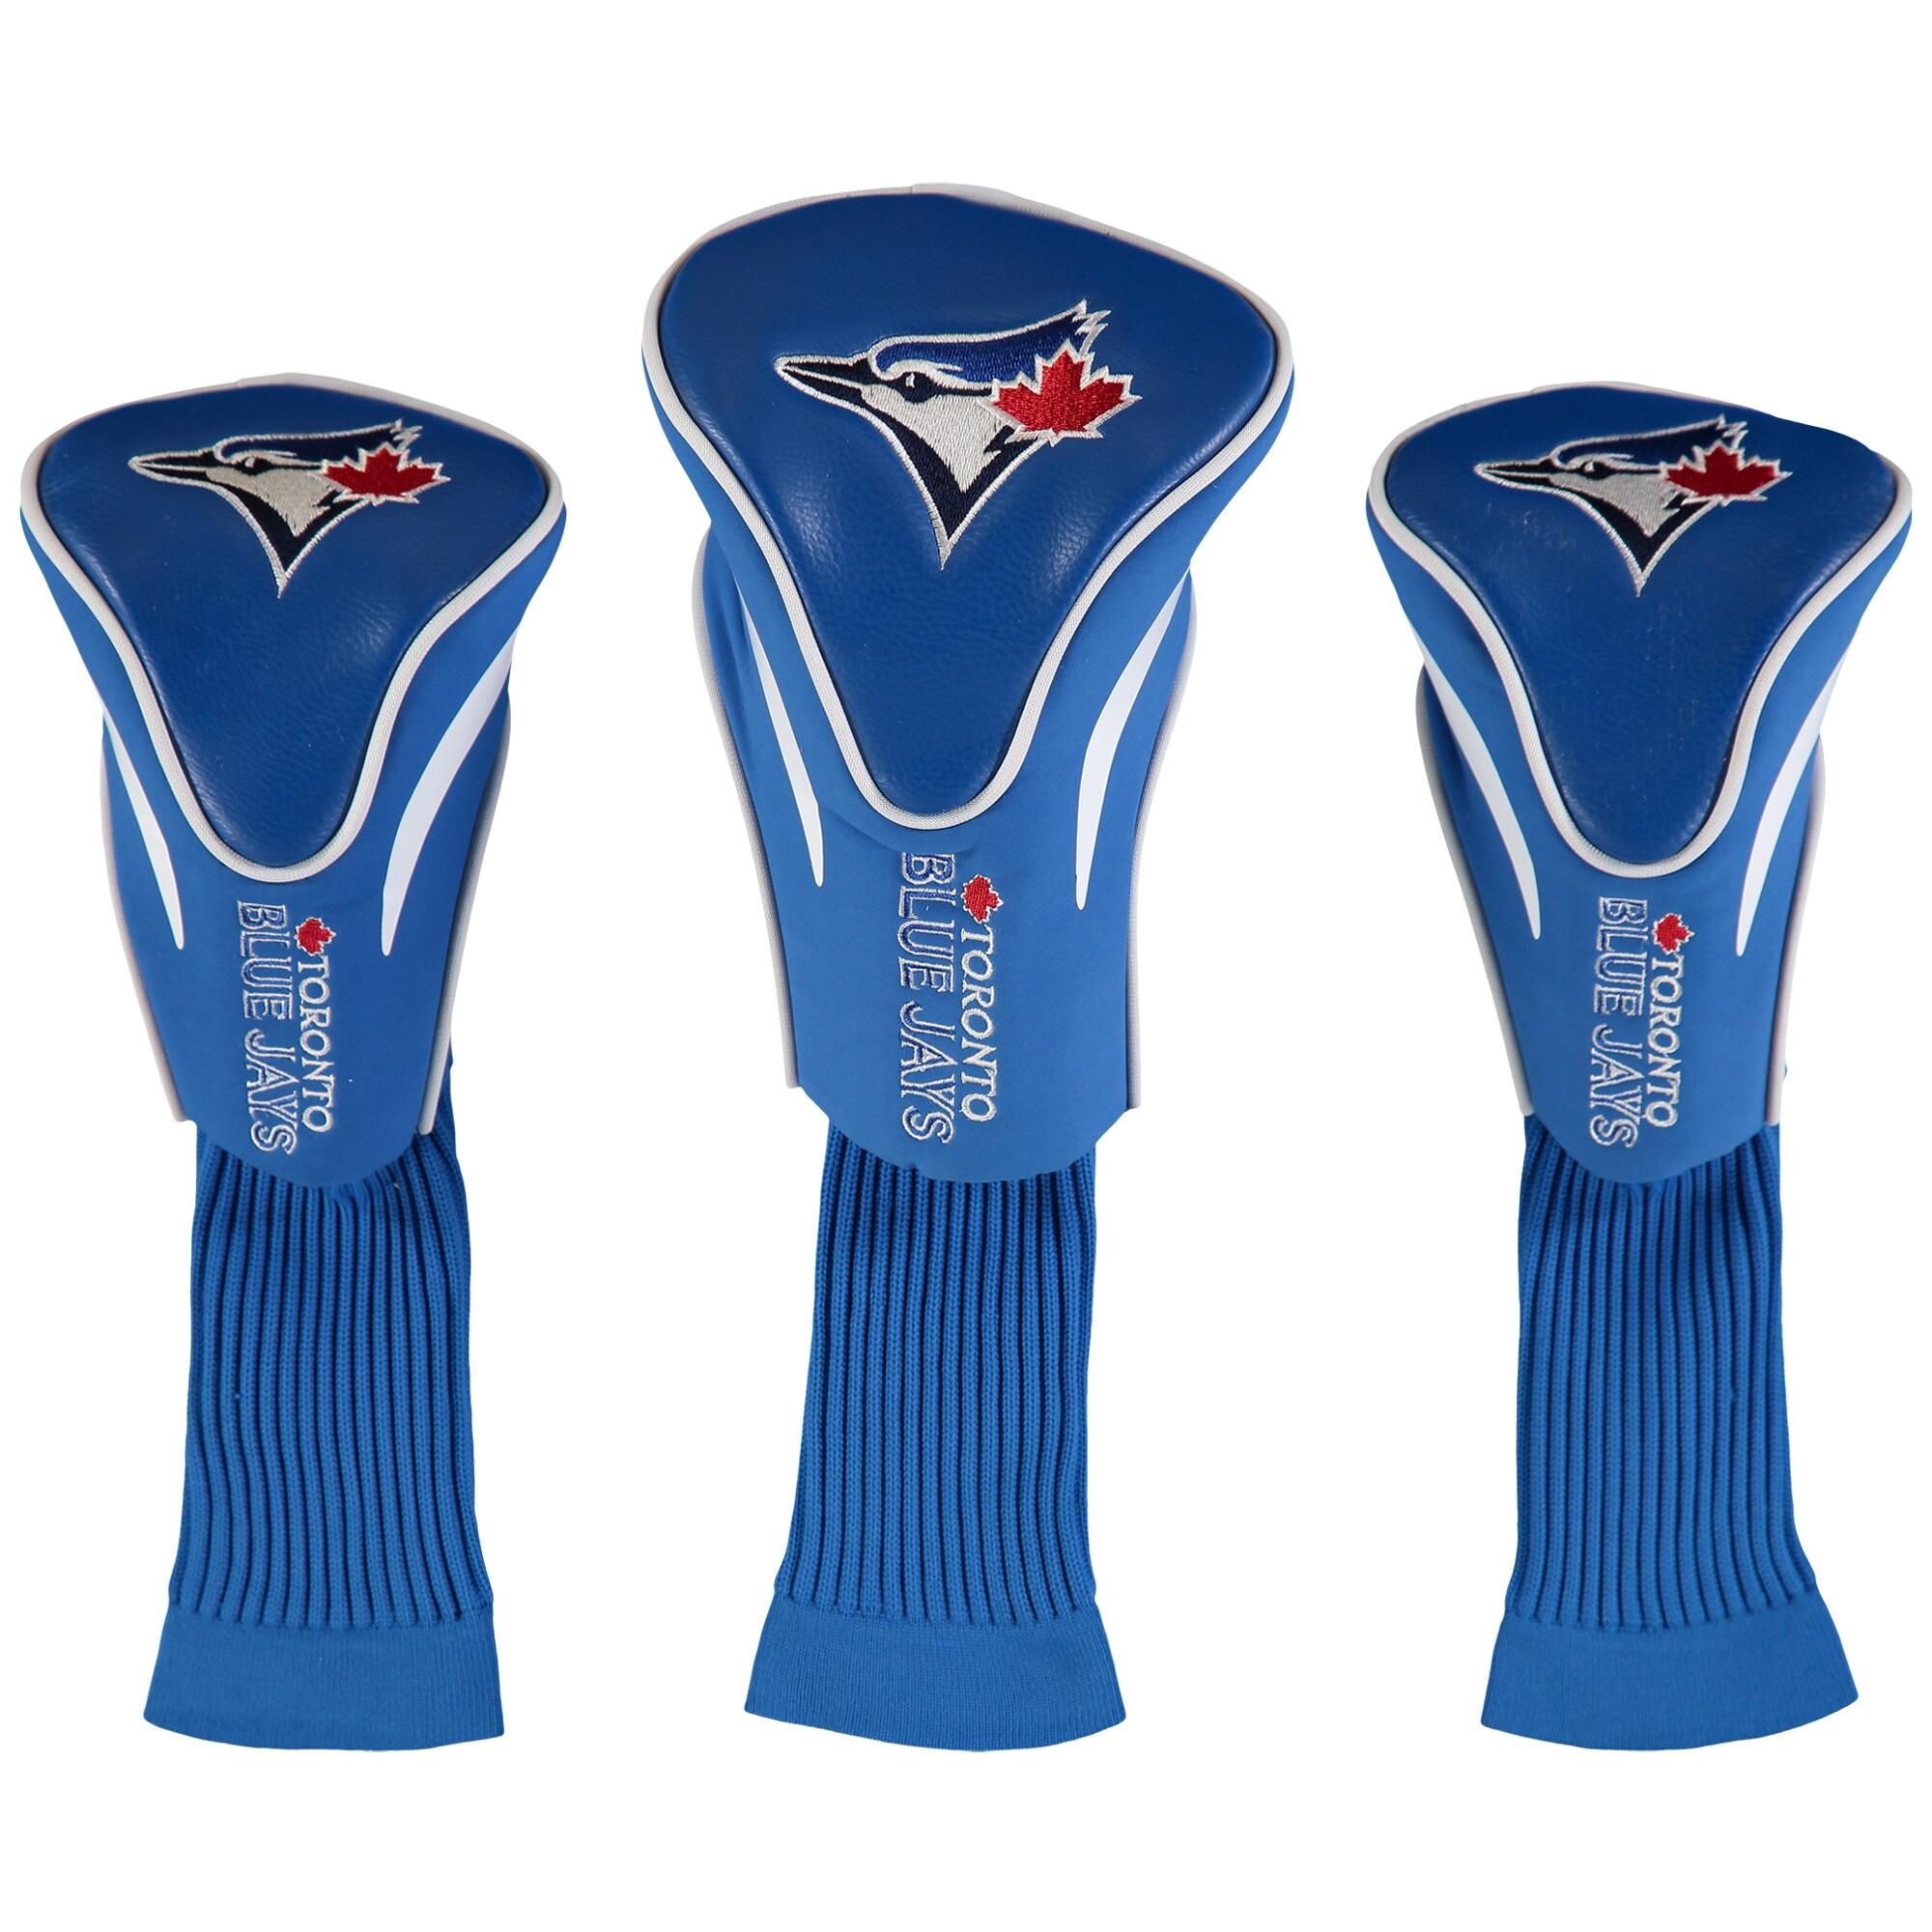 Toronto Blue Jays 3-Pack Contour Golf Club Head Covers